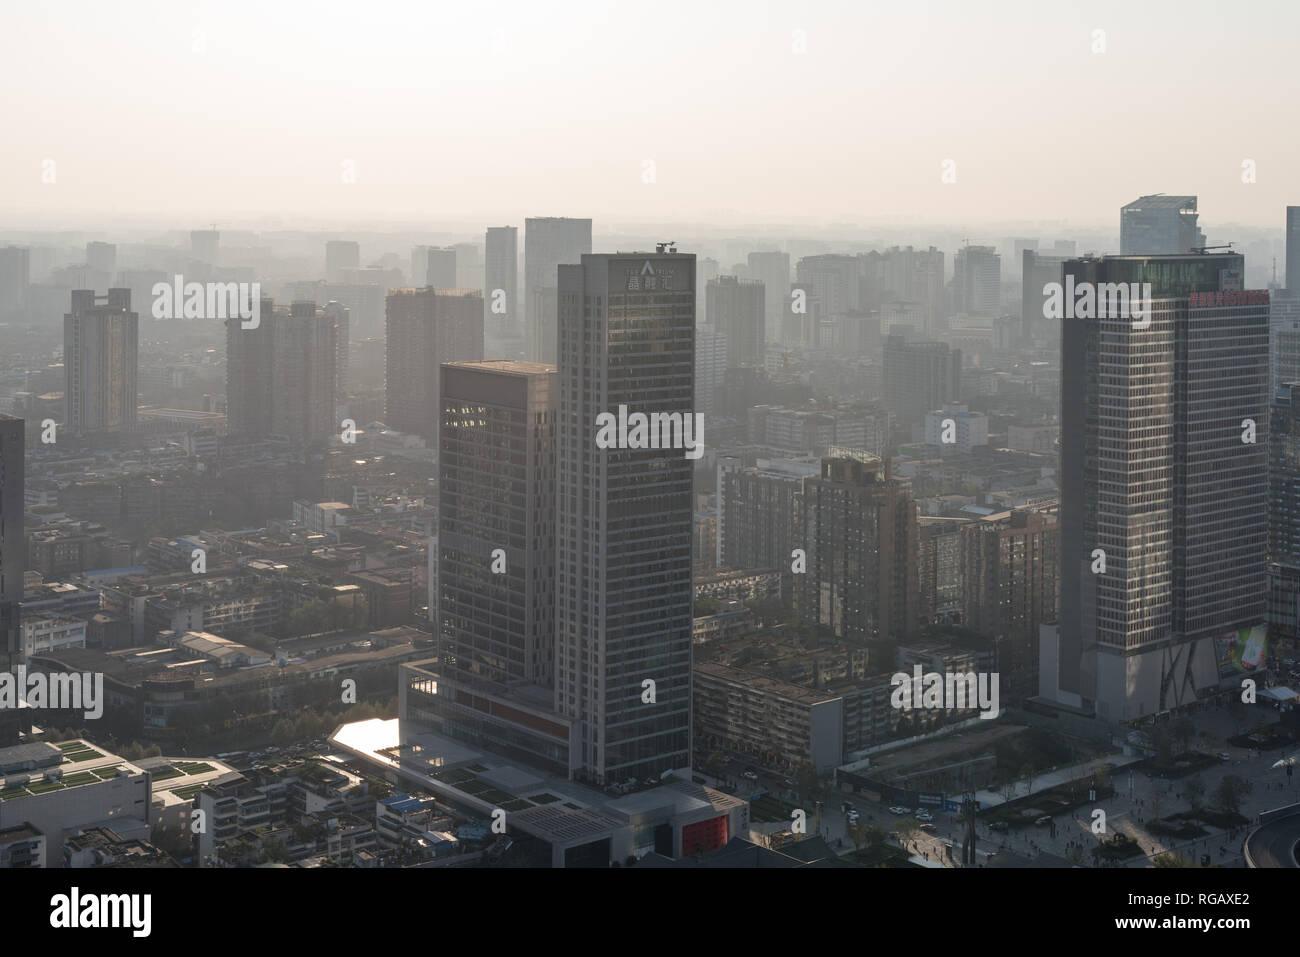 Chengdu, Sichuan province, China - Nov 8, 2015: Chengdu skyline aerial view in the haze Stock Photo